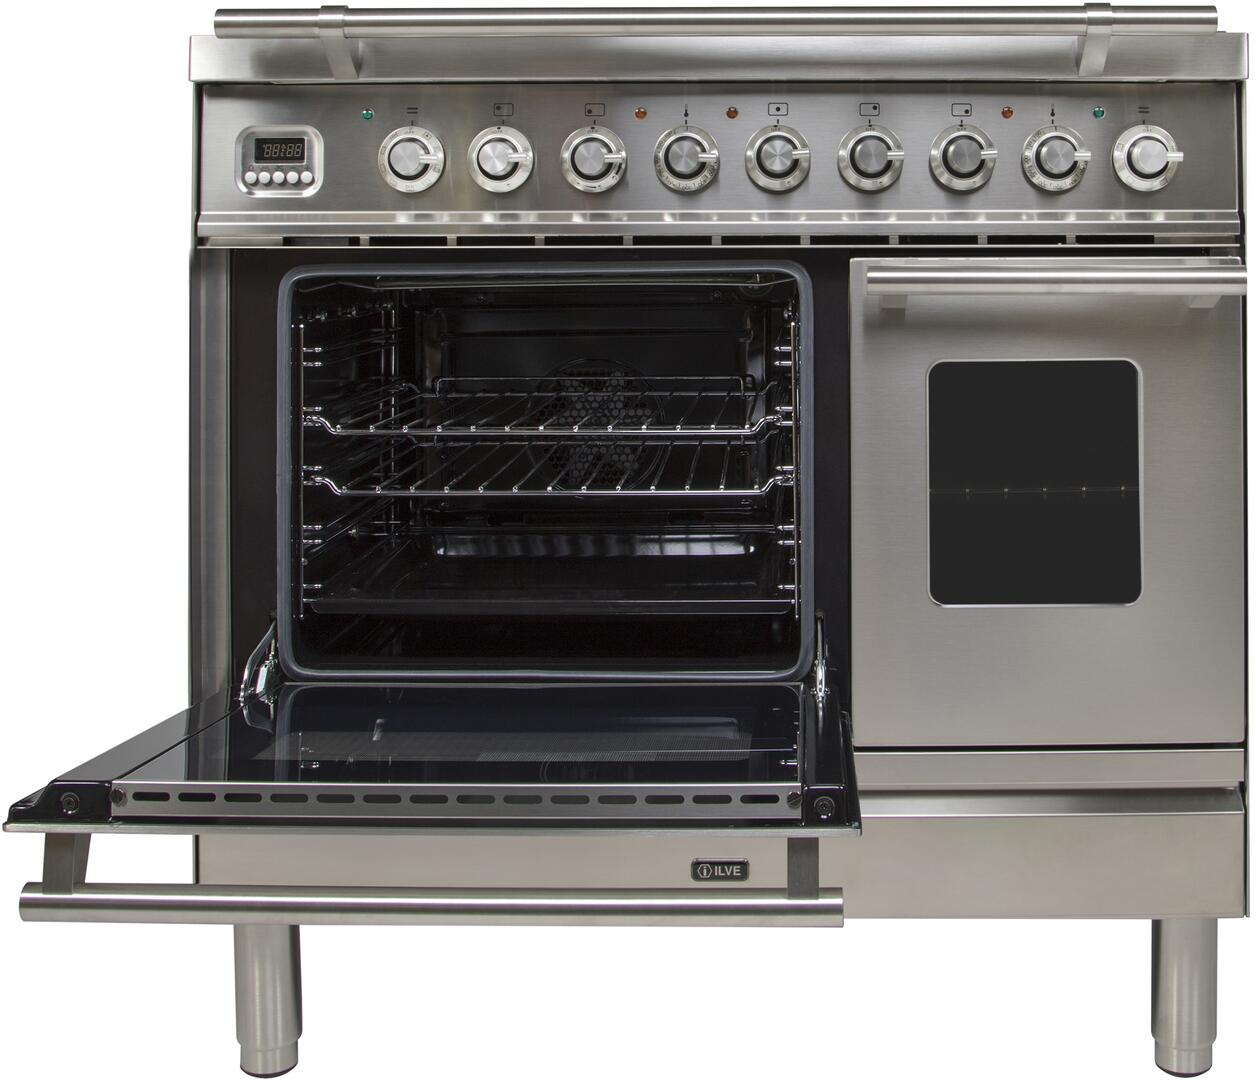 Ilve Professional Plus UPDW90FDMPI Freestanding Dual Fuel Range Stainless Steel, Main Oven Door Opened